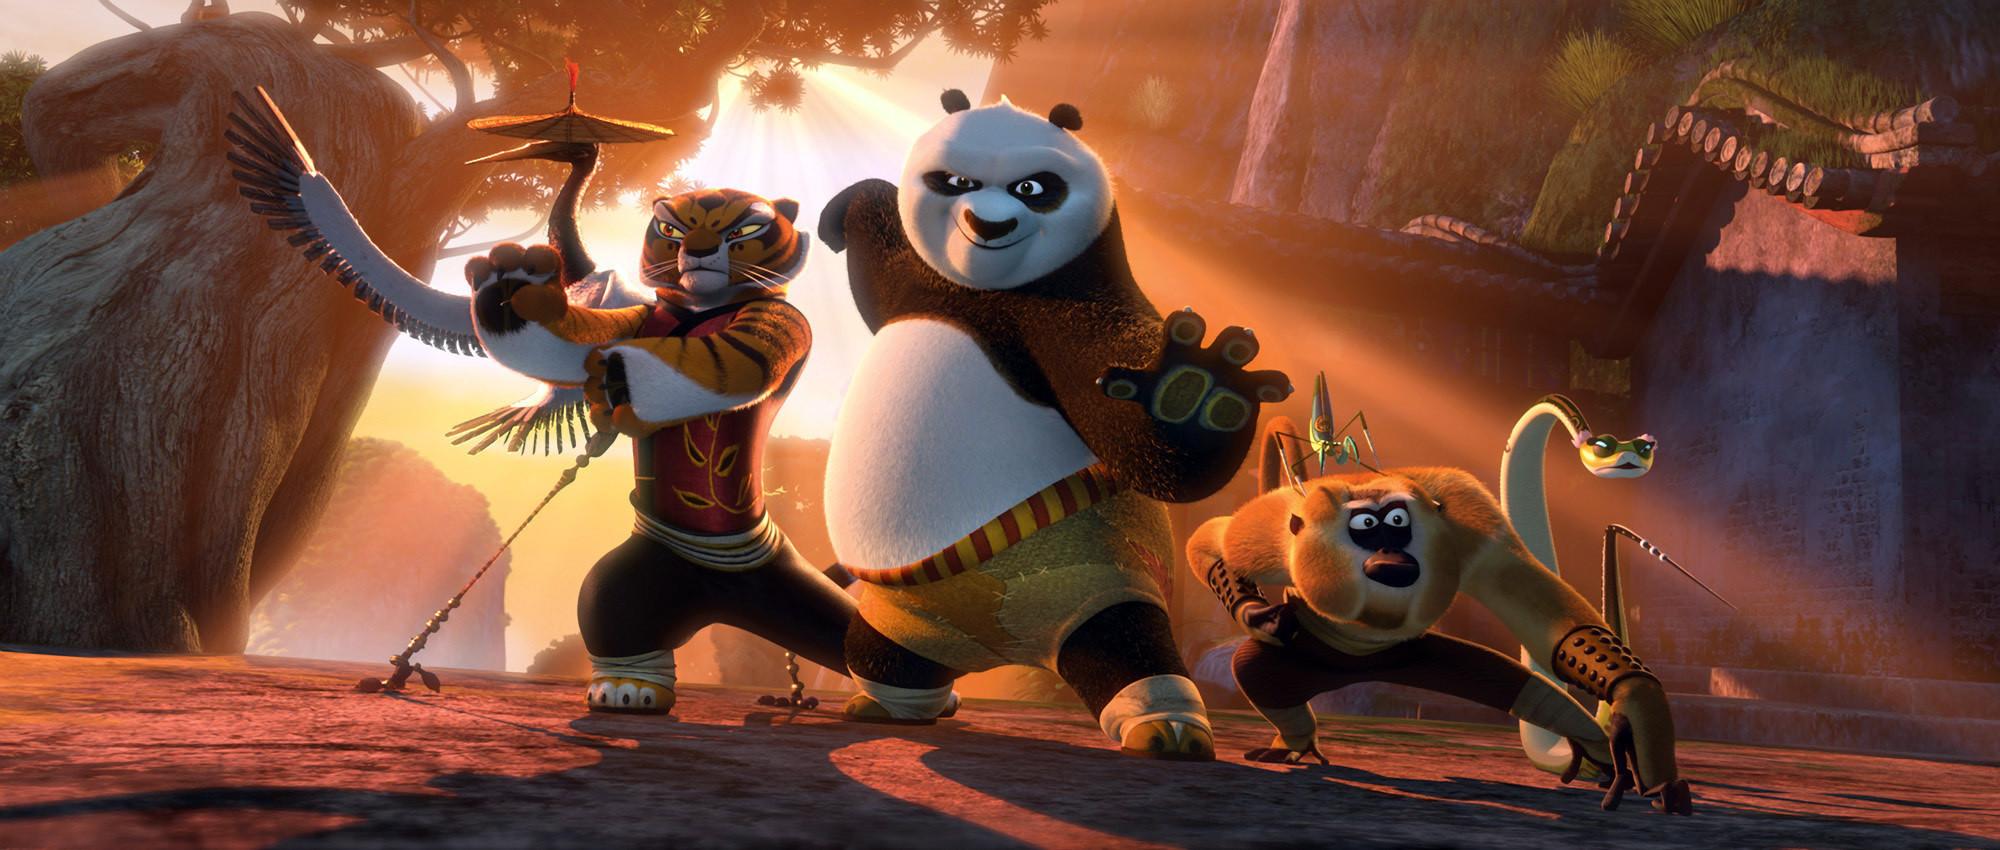 Kung Fu Panda - group